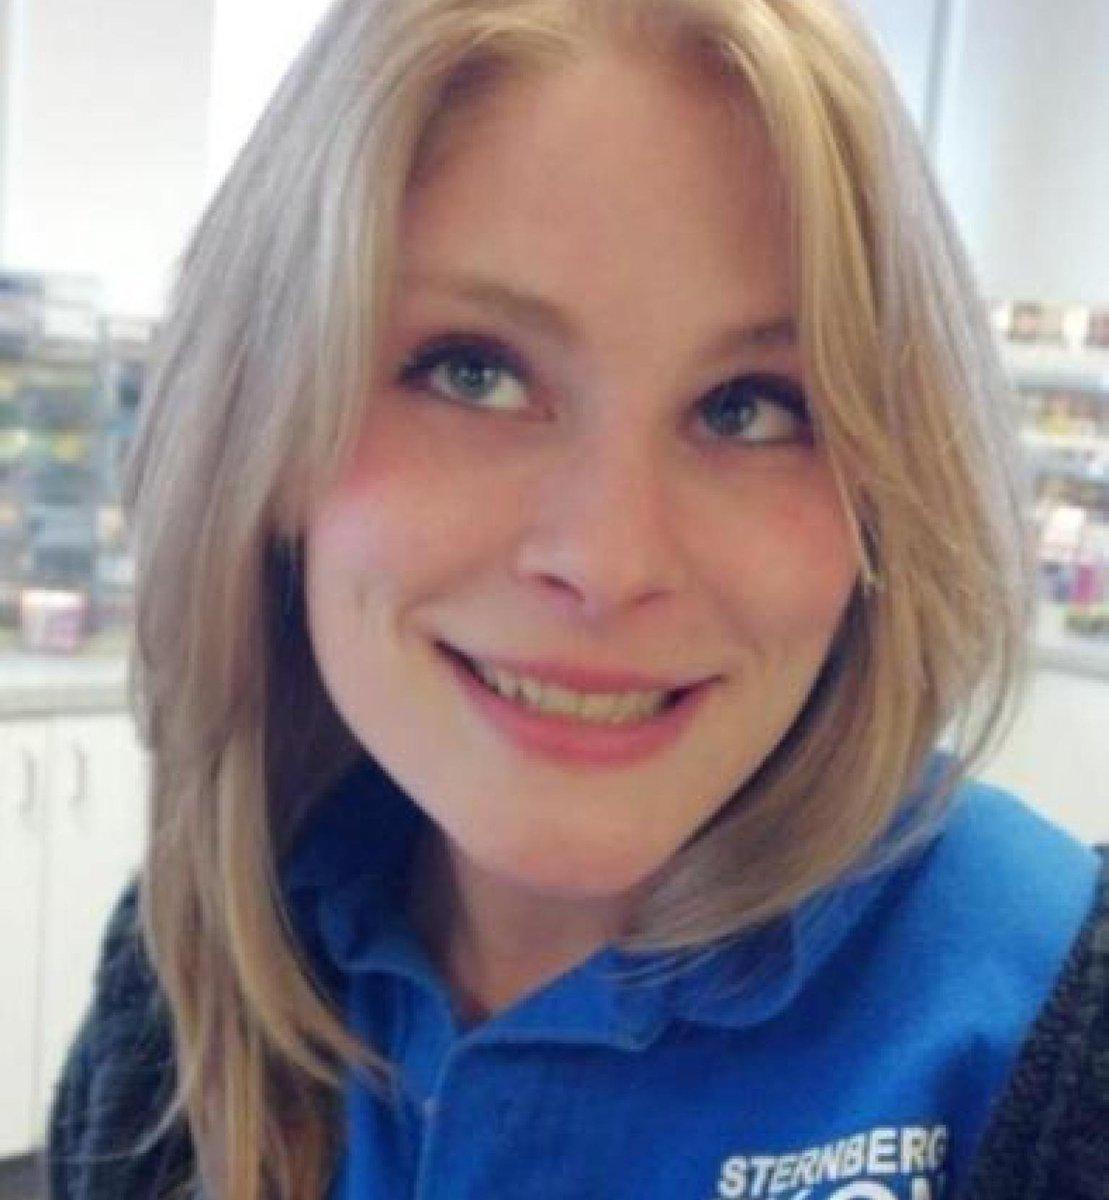 Her body has never been found. http://www.woodtv.com/news/jeffrey-willis-investigation/verdict-reached-in-jessica-heeringa-murder-trial/1181626362  … ...